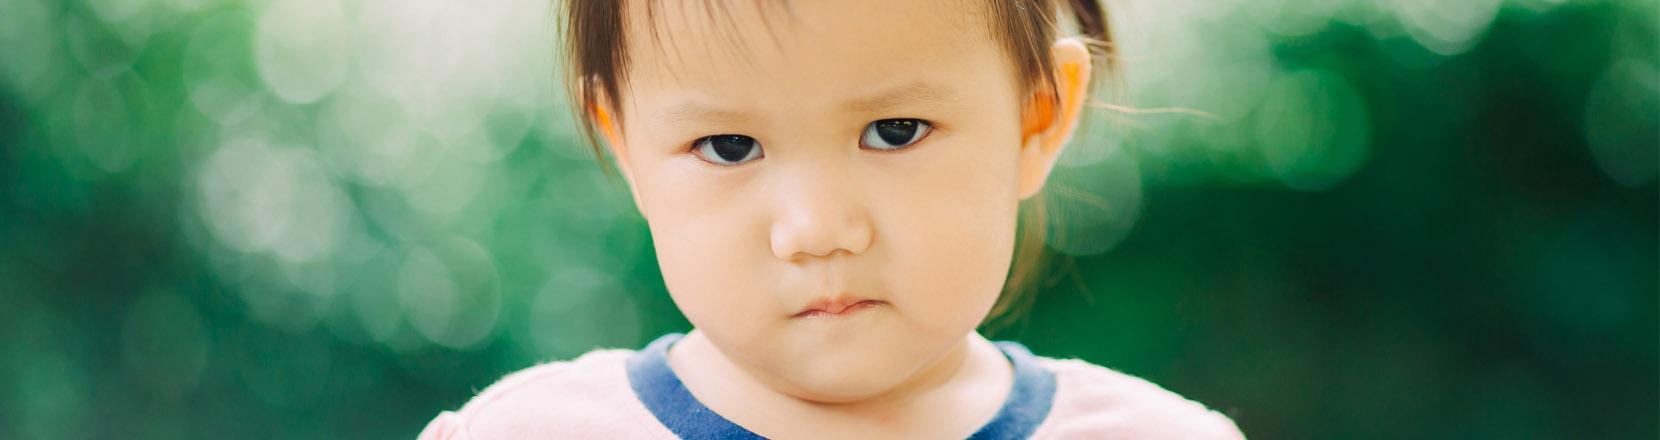 Bambina piccola arrabbiata e rancorosa